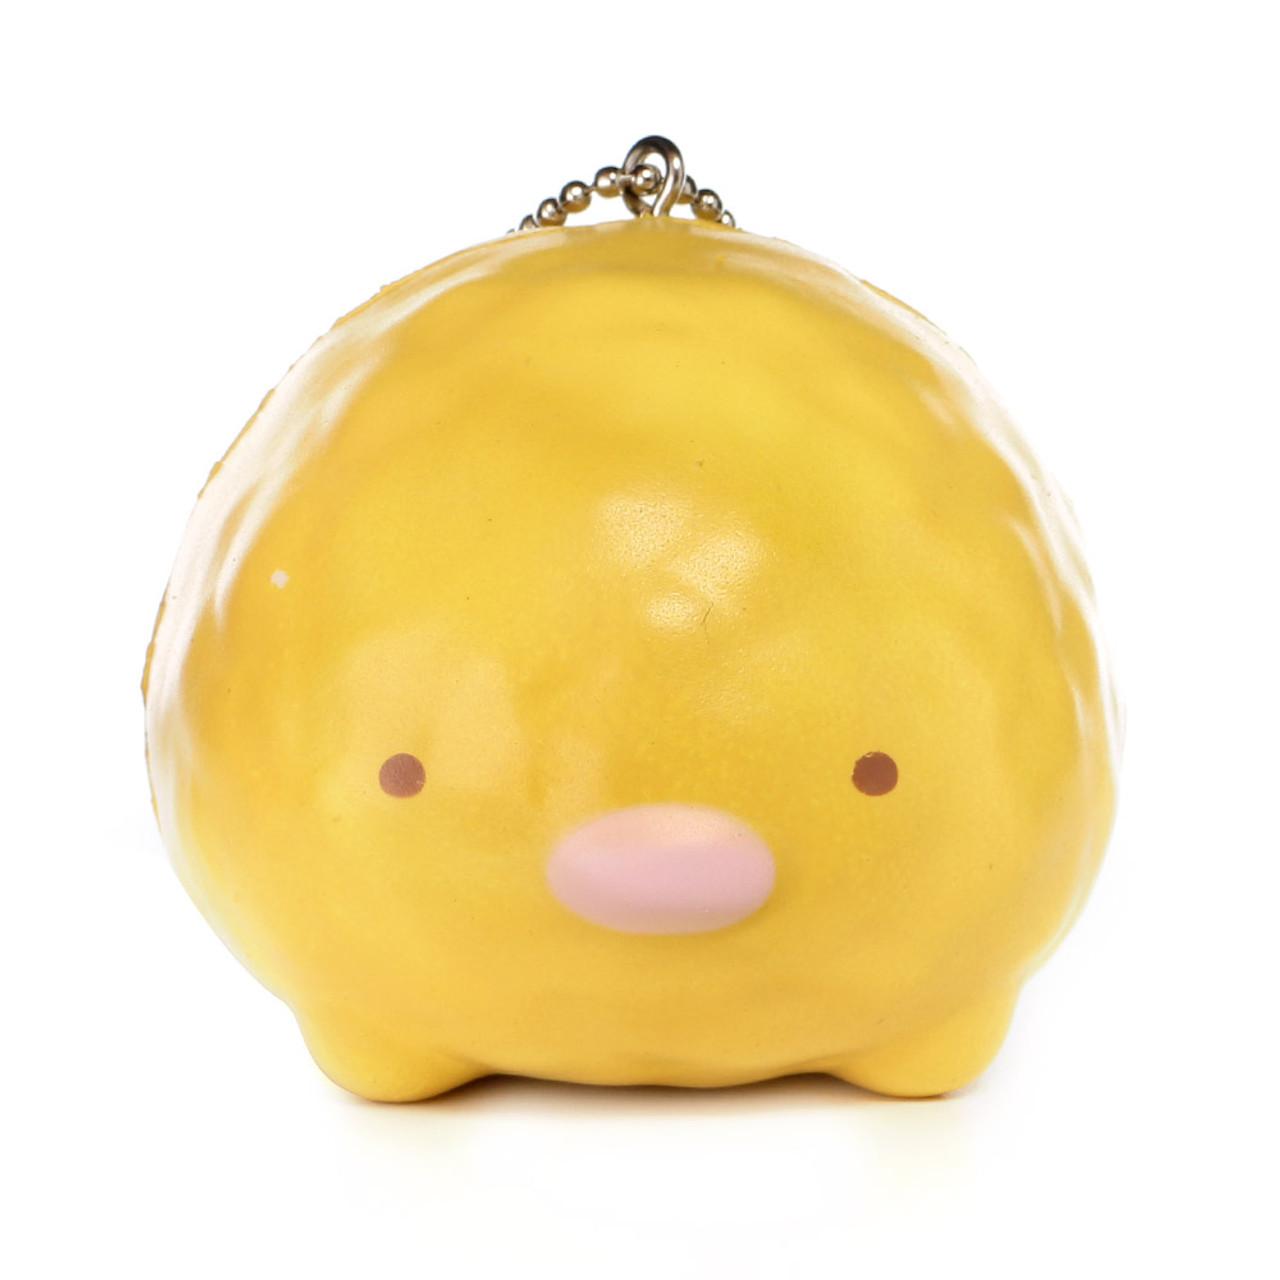 San-x Sumikko Gurashi Tsum Tsum Style Tonkatsu Pork Cutlet Squishy Toys Charms ( Front View )